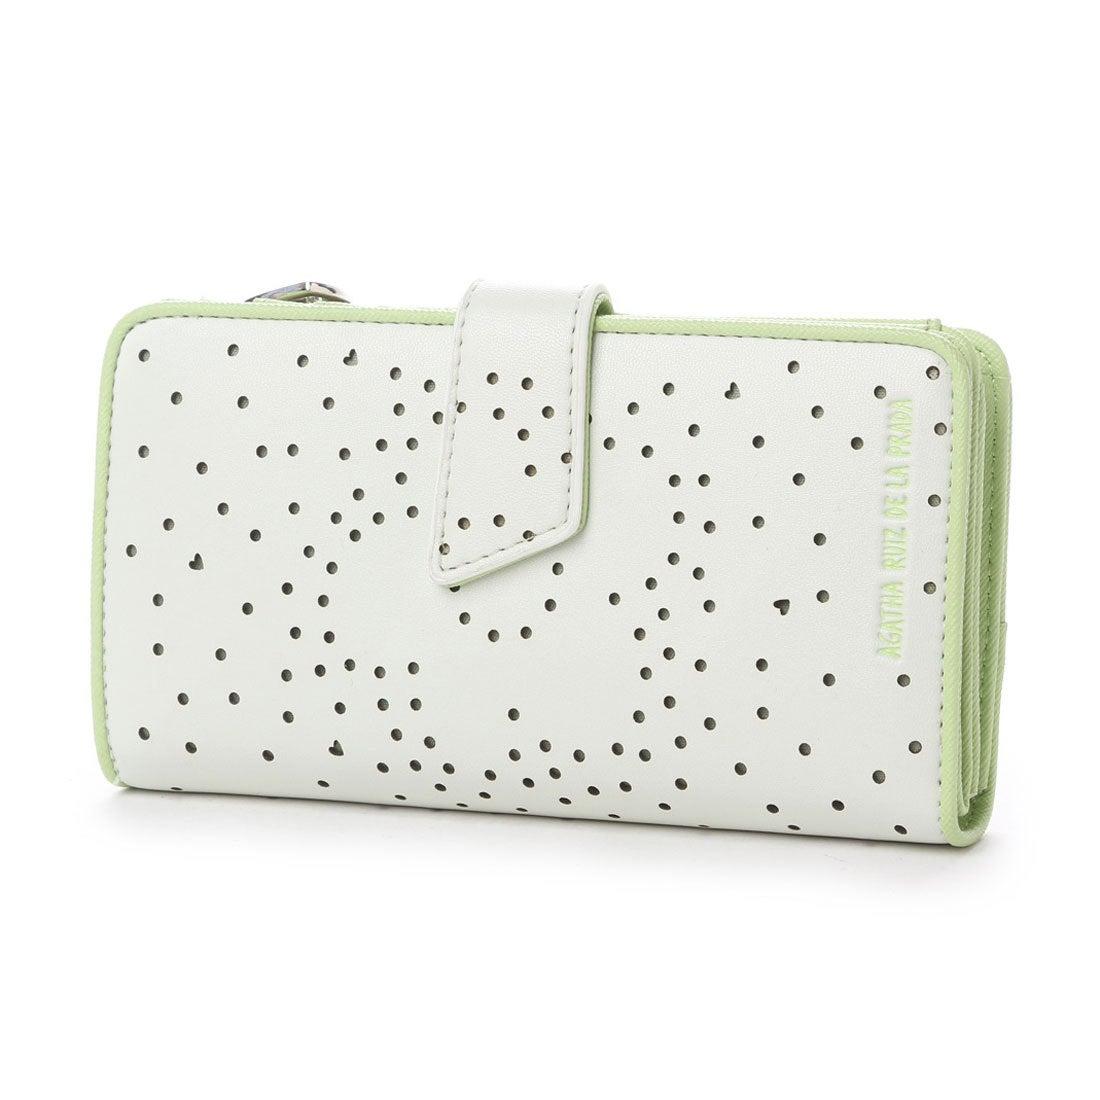 f3f0d3e7c665 アガタ ルイス デ ラ プラダ AGATHA RUIZ DE LA PRADA 花パンチング大容量財布 (WHITE) -アウトレット通販 ロコレット  (LOCOLET)